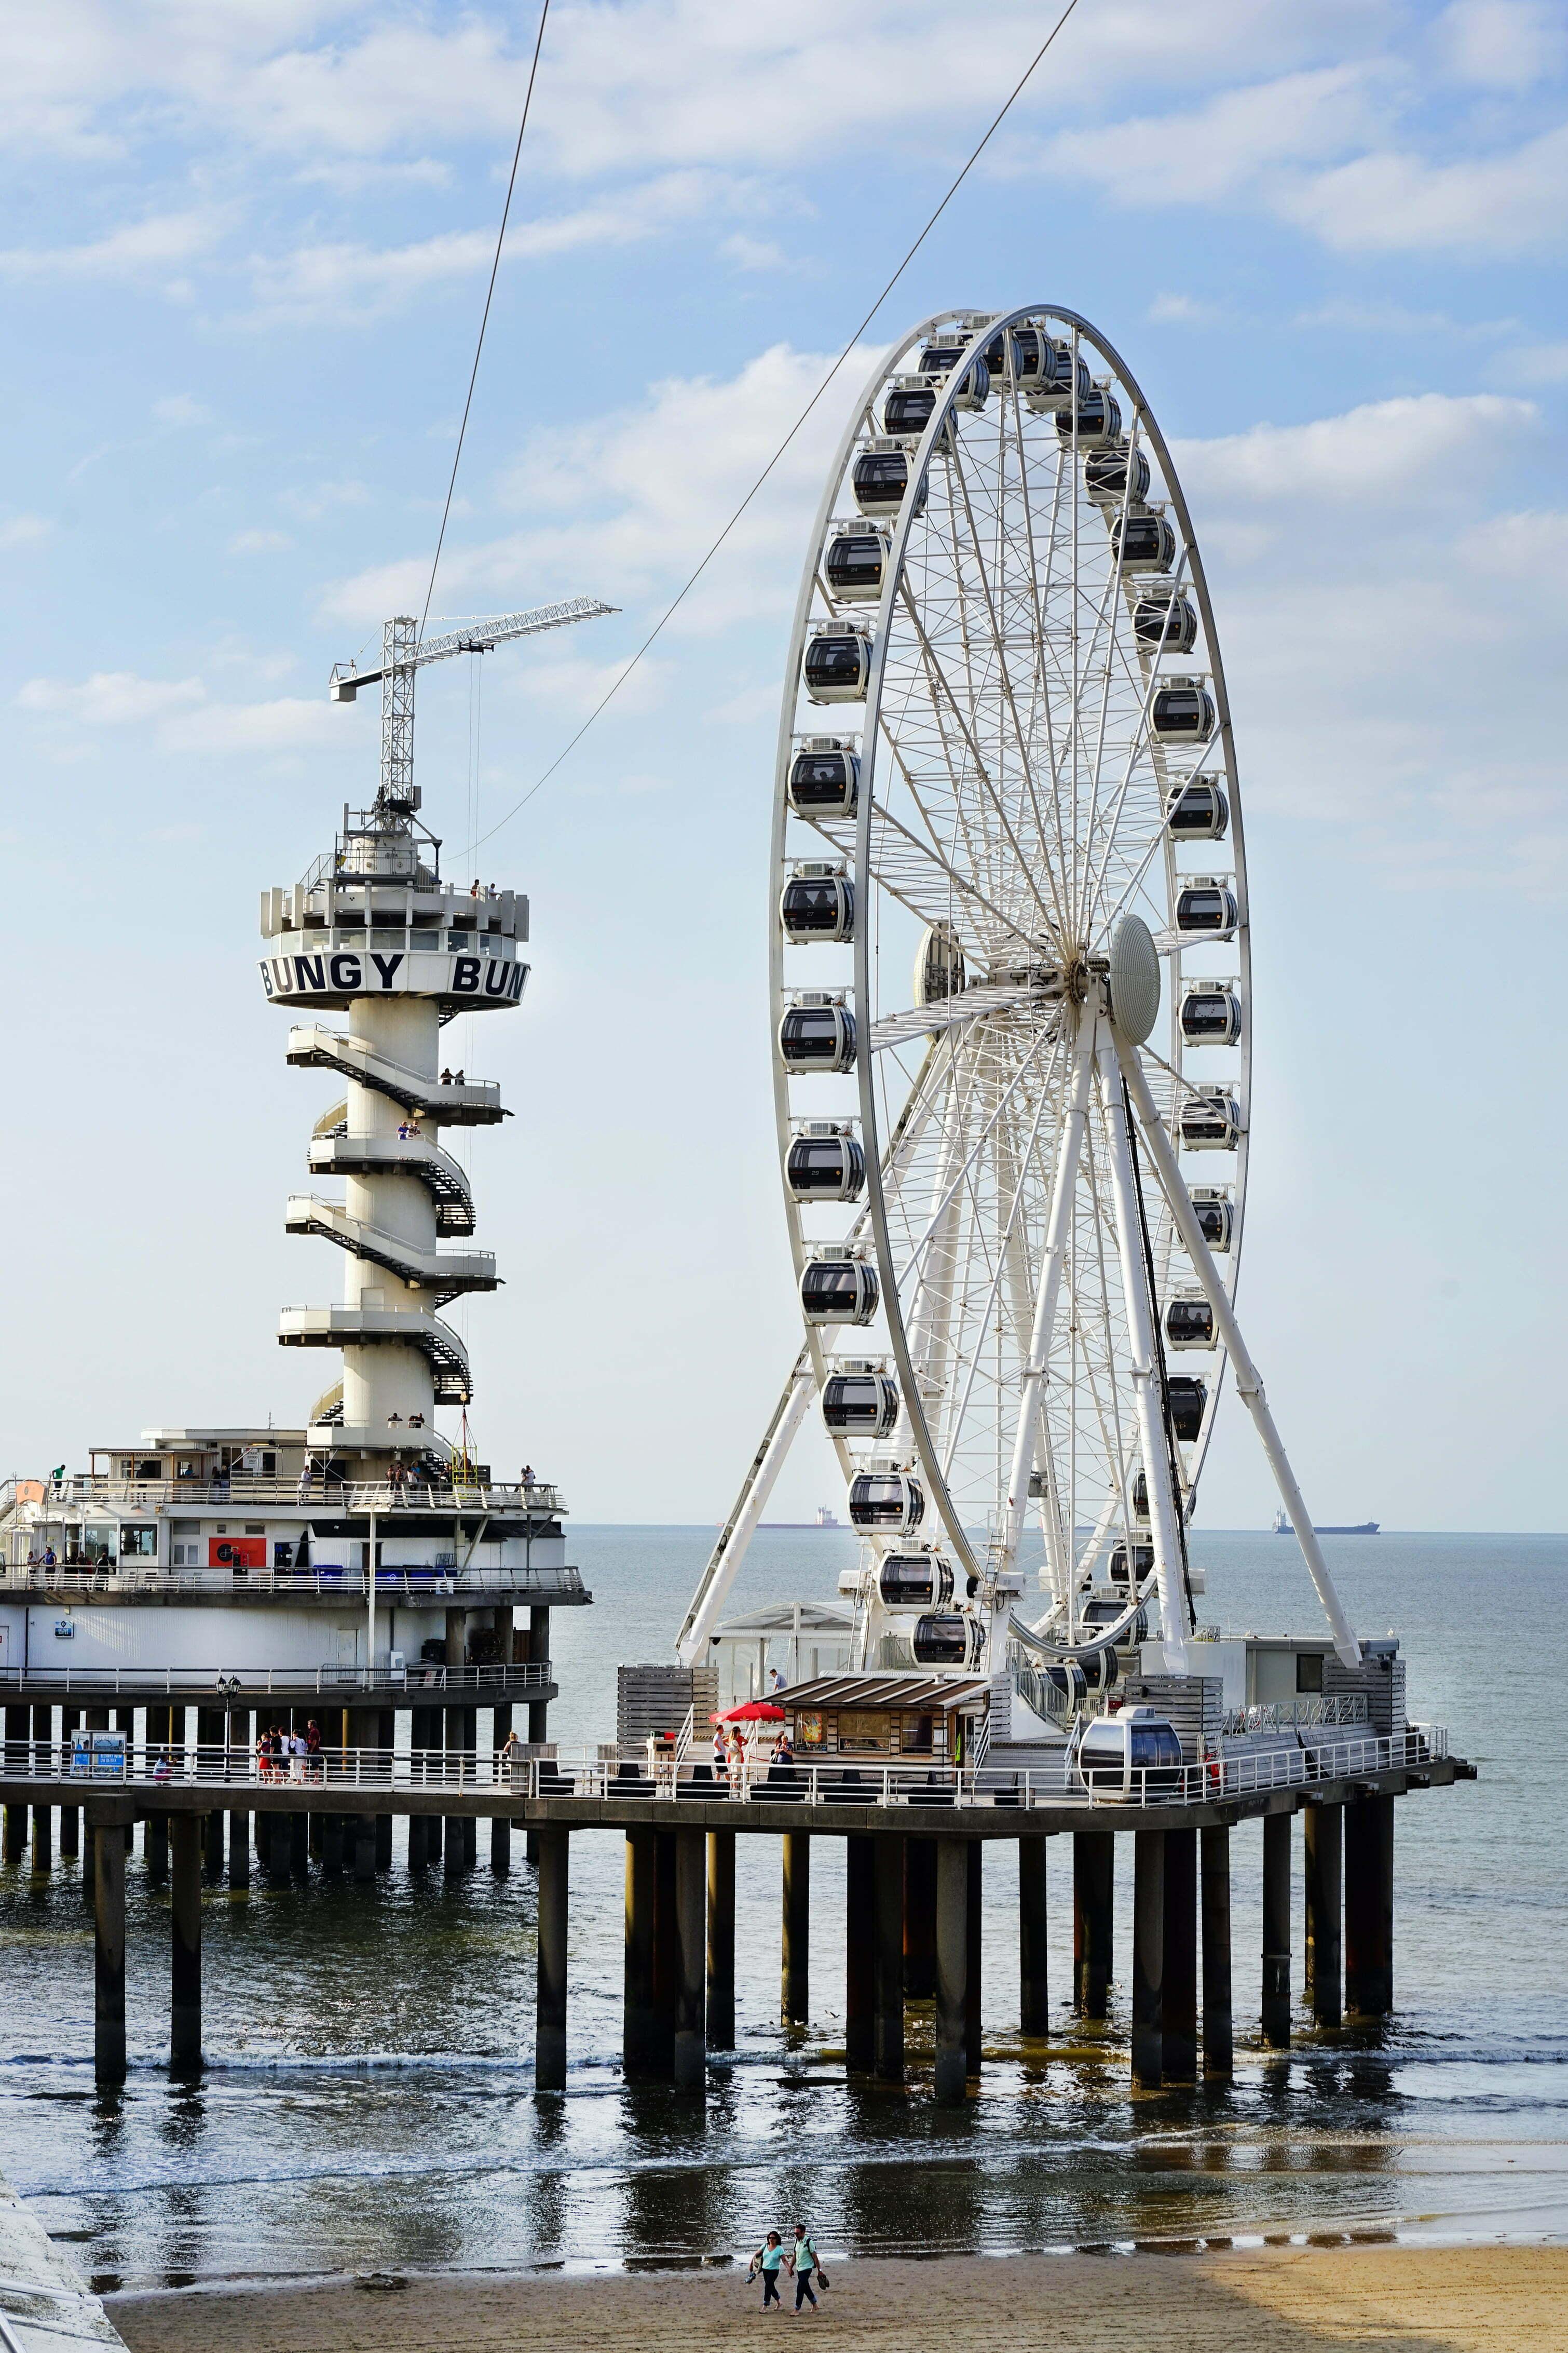 Pier Den Haag